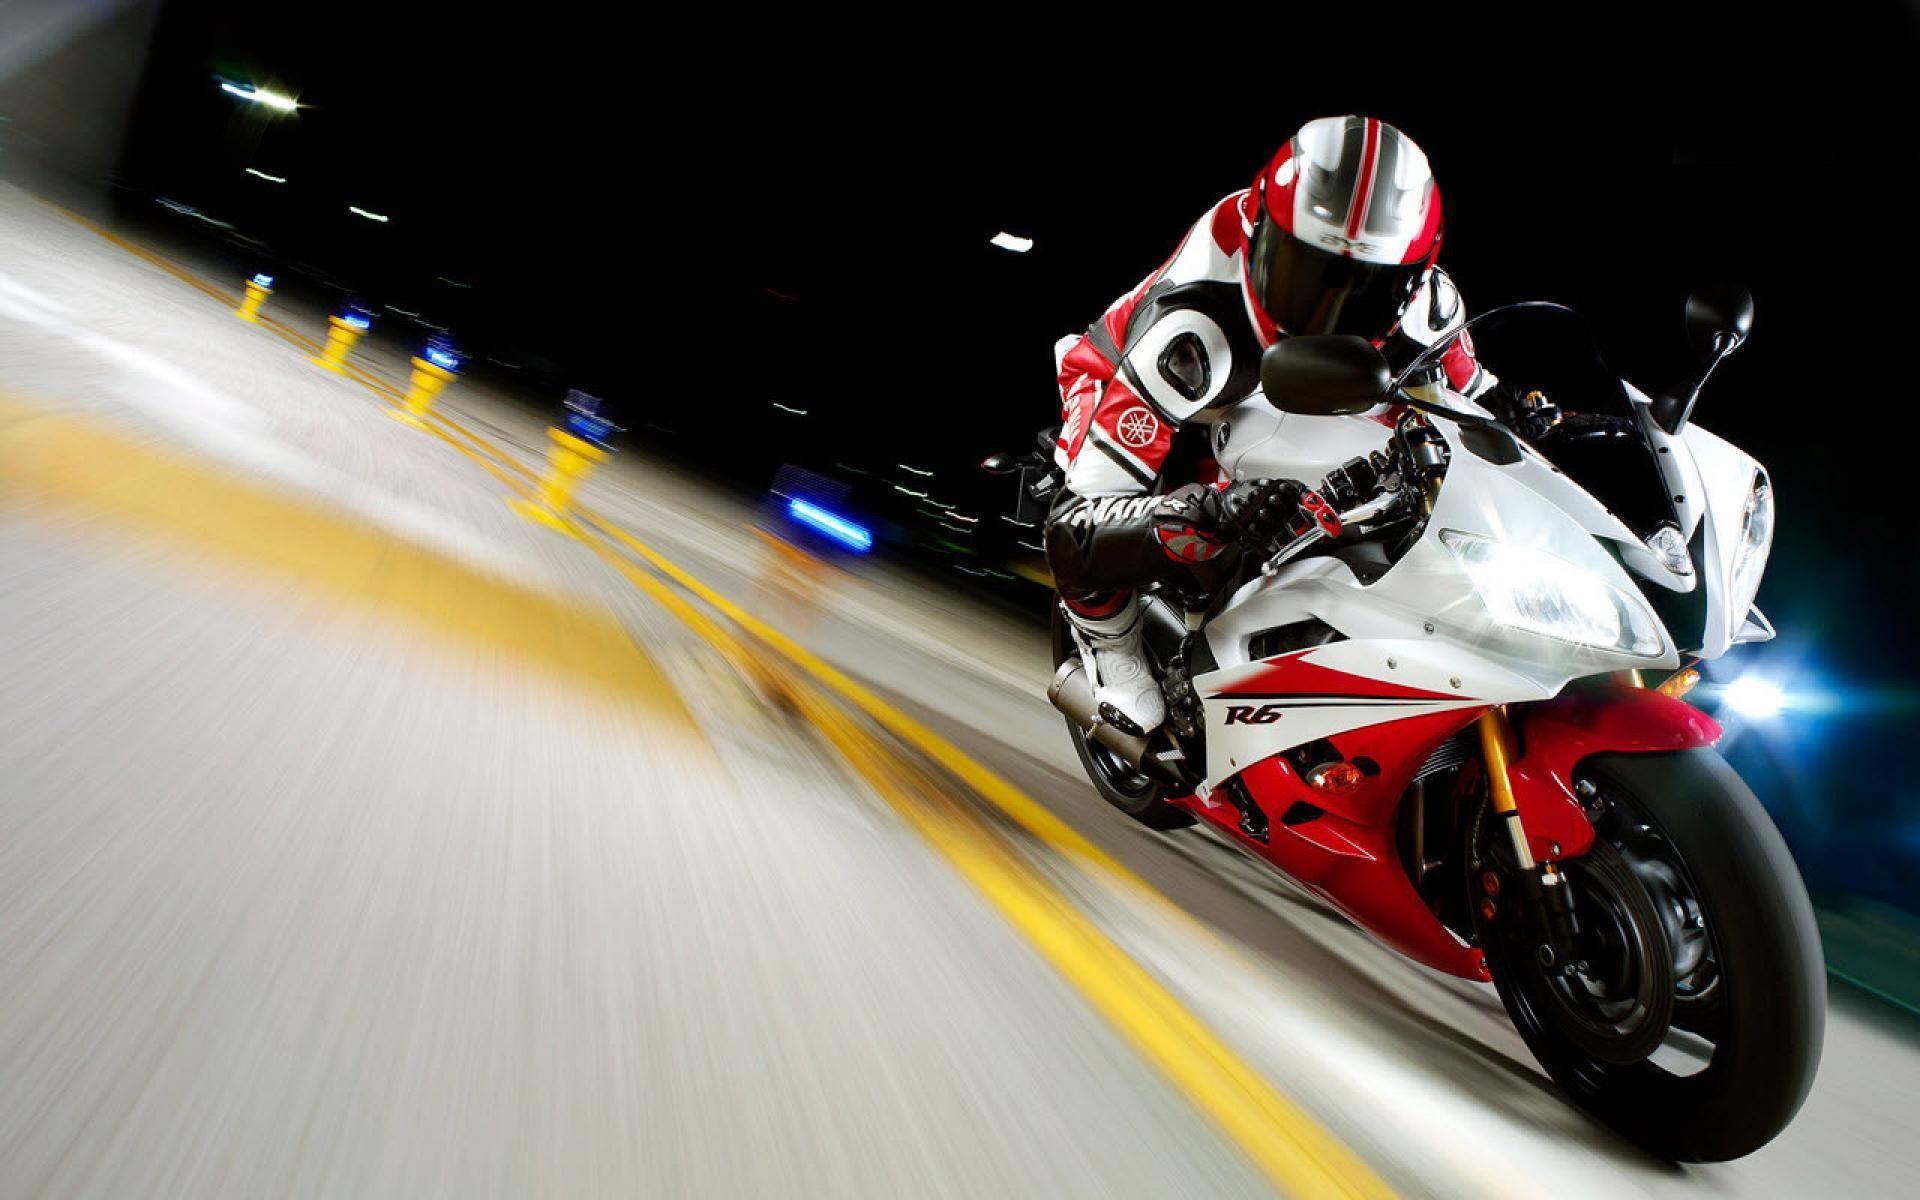 Yamaha YZFR6 Race Wide – 1080p HD Wallpaper